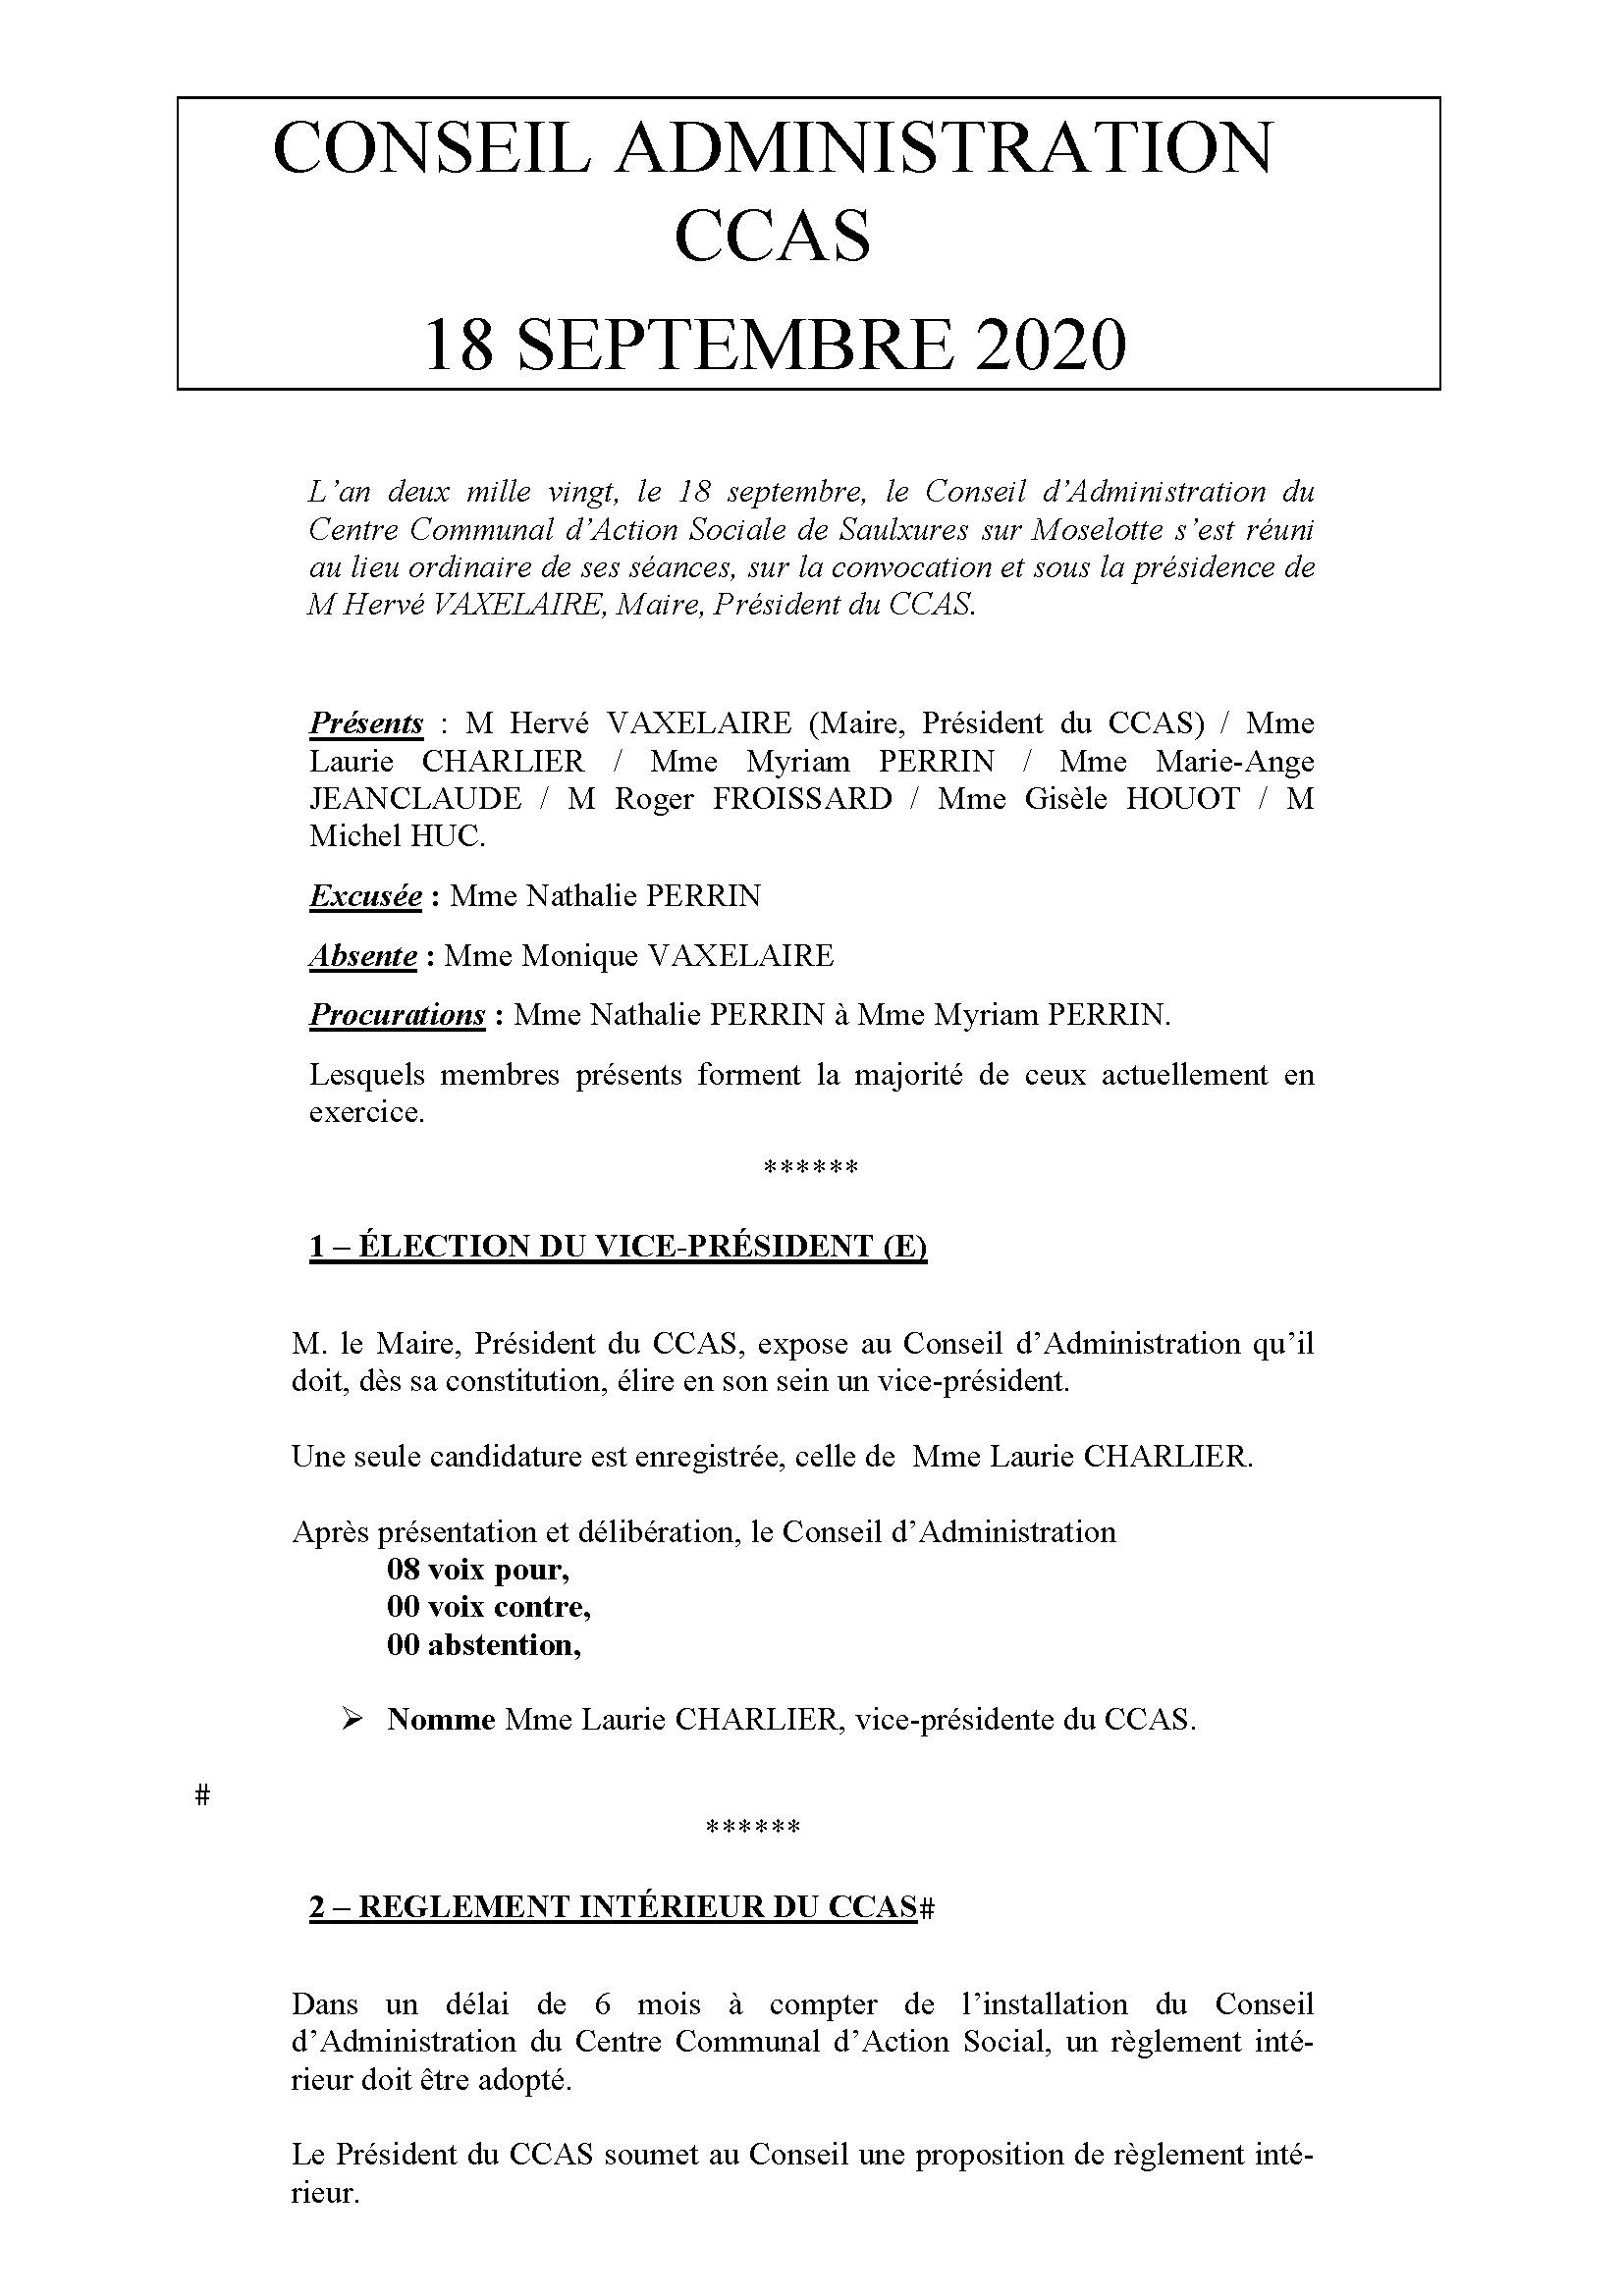 COMPTE RENDU CCAS 18 SEPTEMBRE 2020